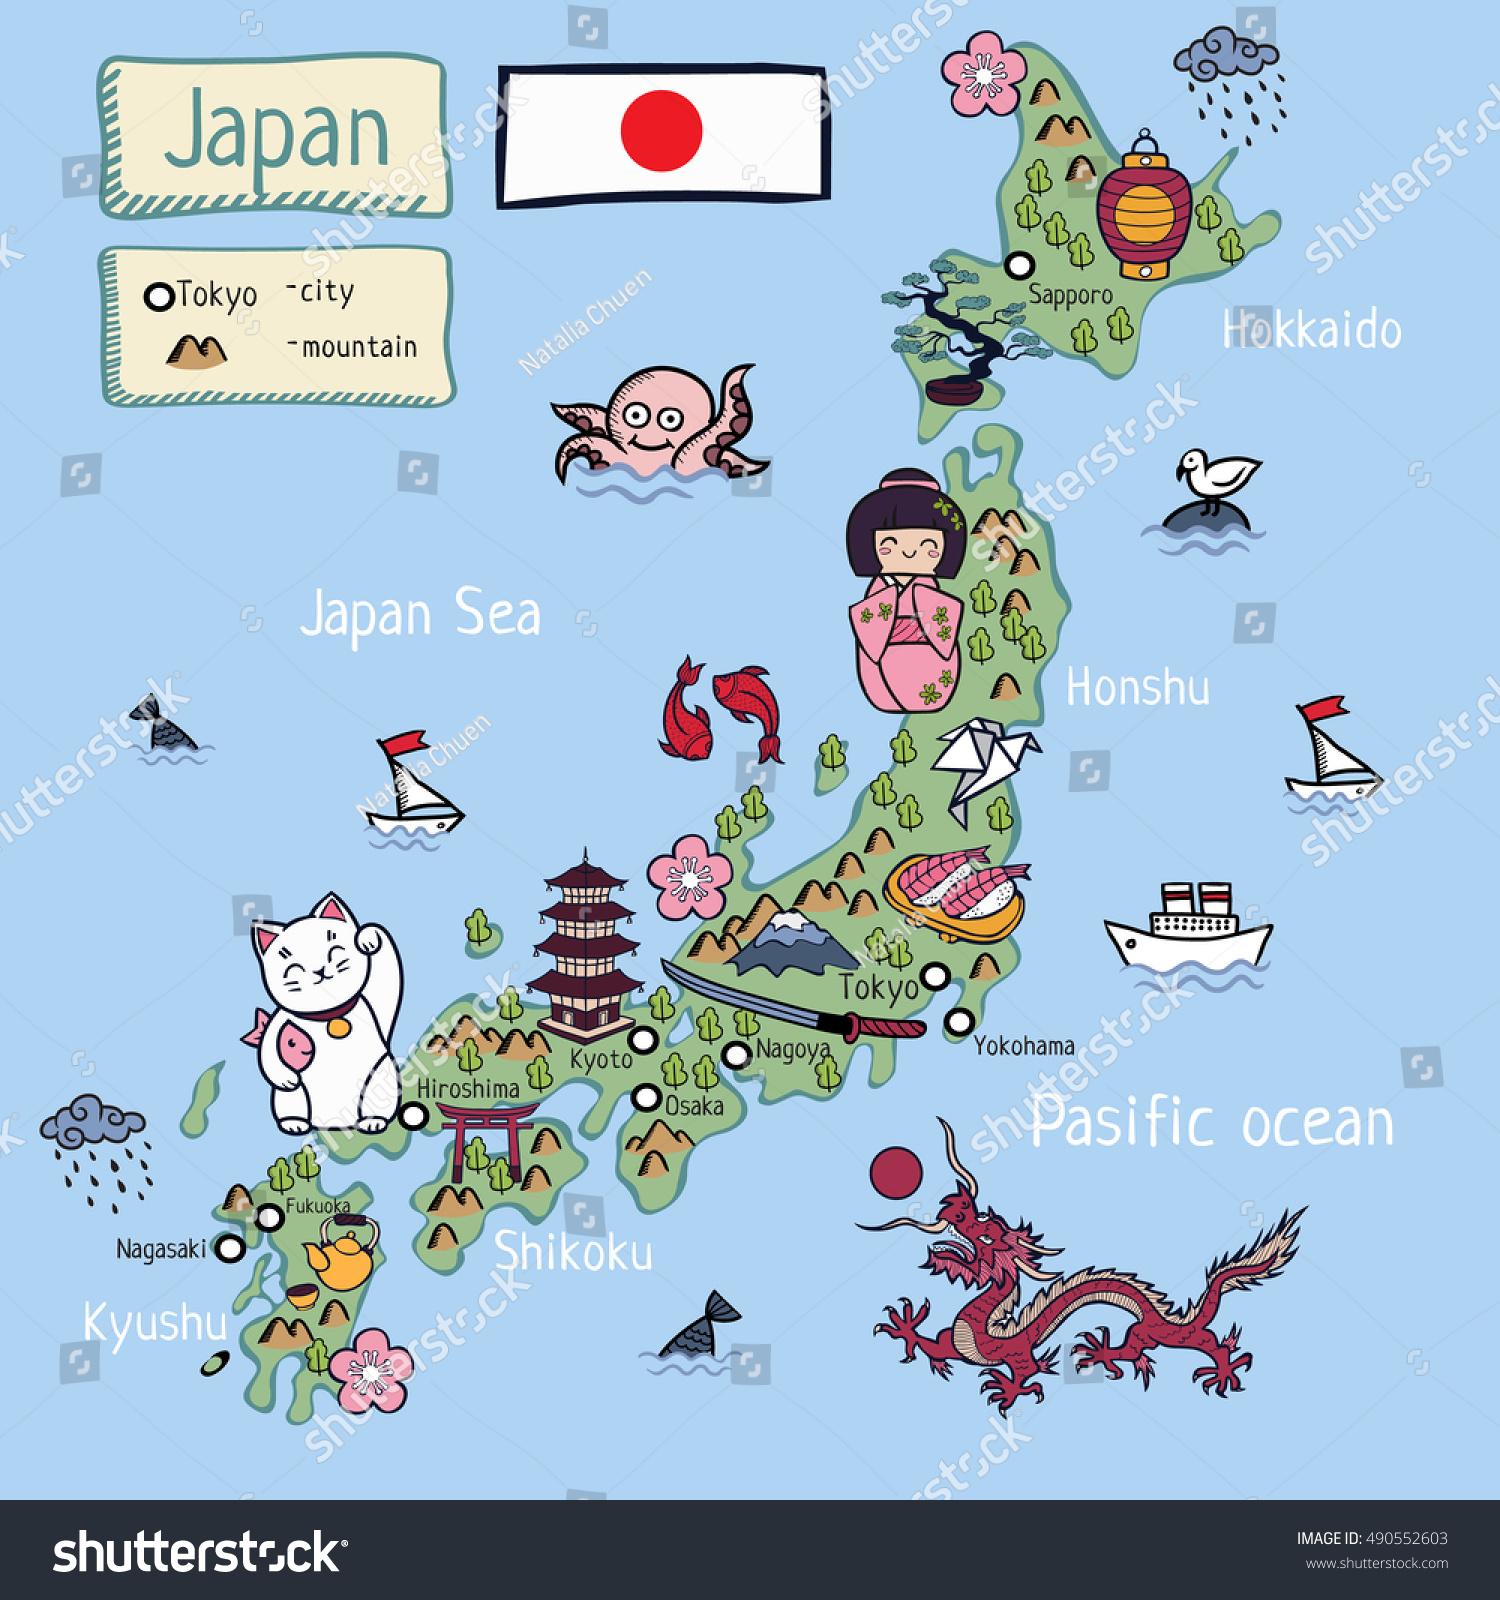 Cartoon Map Japan All Object Isolated Stock Vector